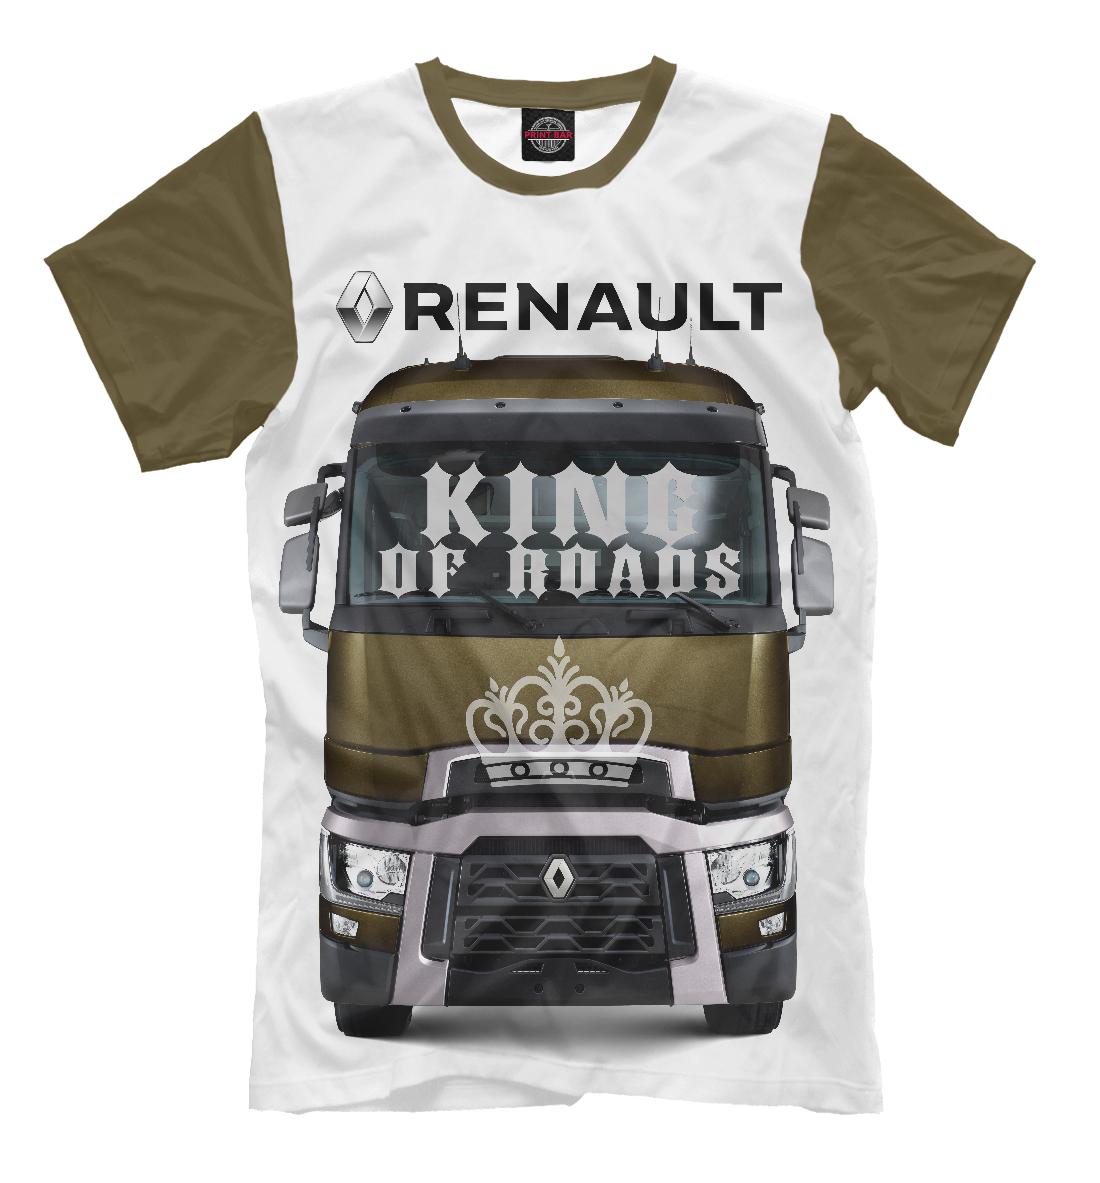 Купить RENAULT - король дорог, Printbar, Футболки, GRZ-918078-fut-2